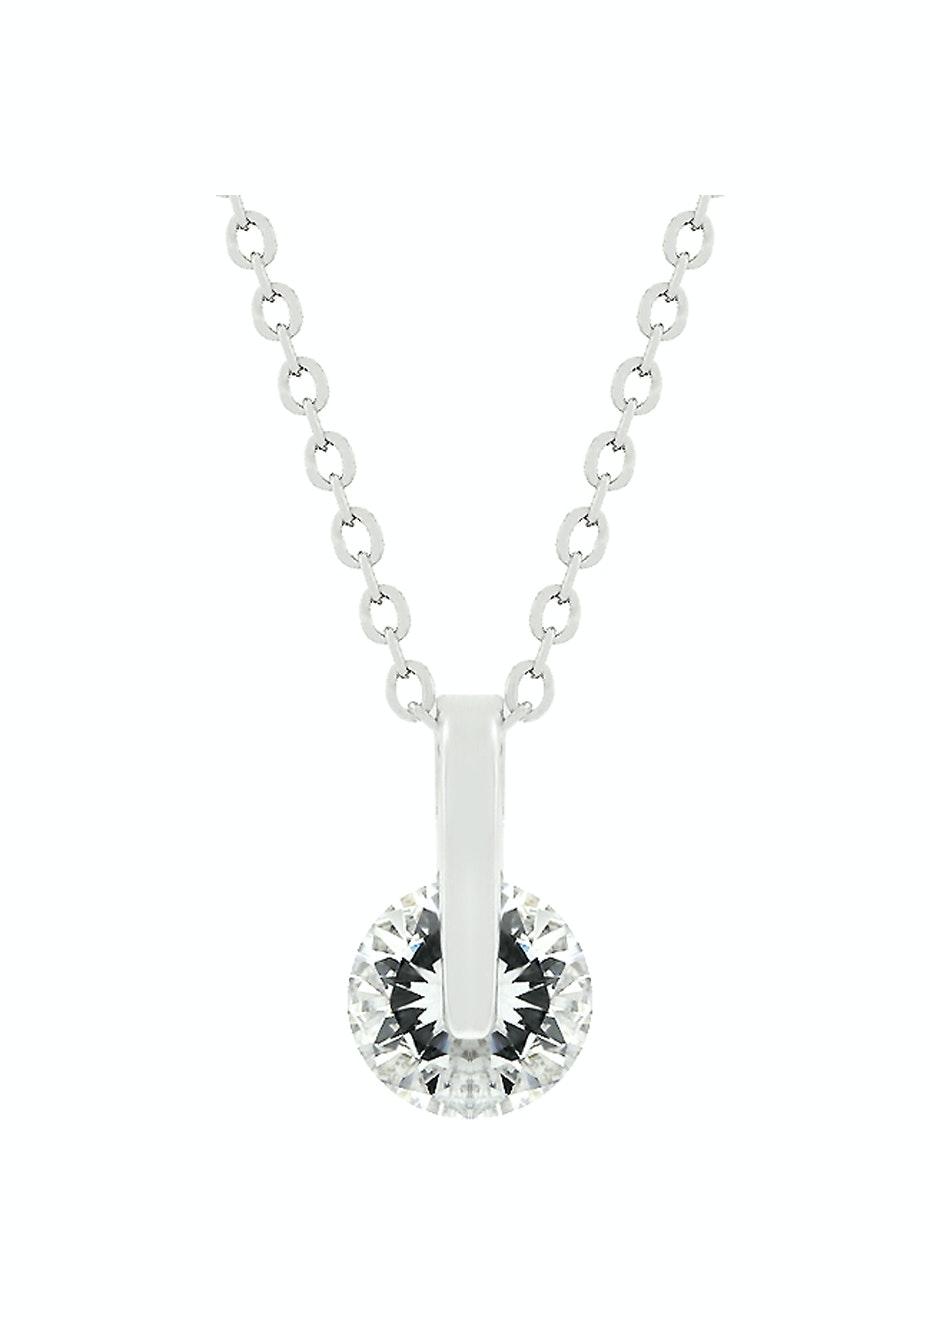 Elegant Tear Drop Pendant Necklace Set